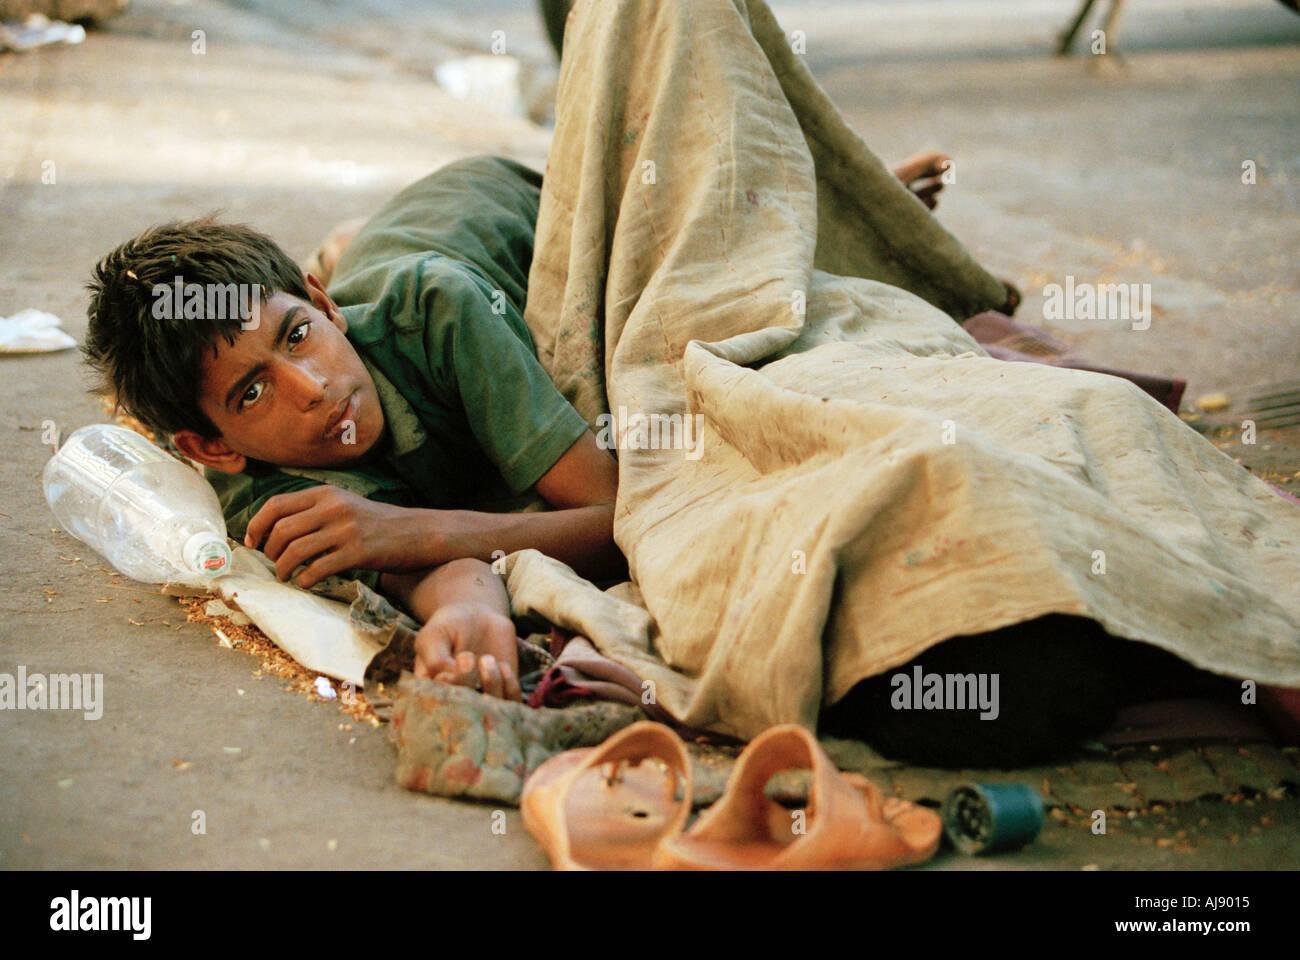 street kid bombay Mumbai India - Stock Image